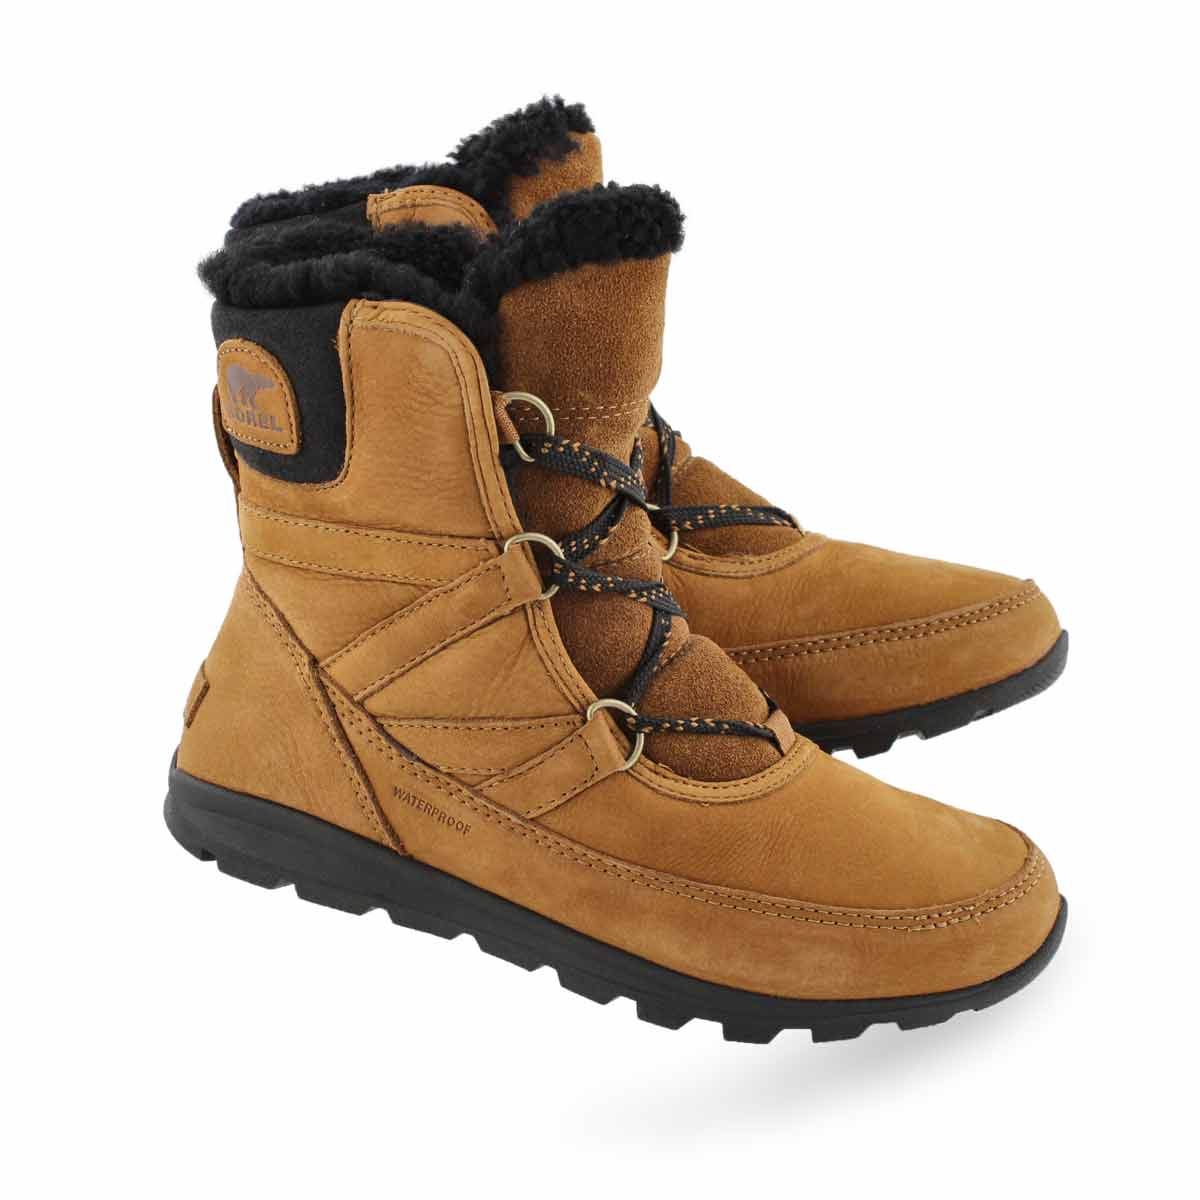 Women's WHITNEY SHORT LACE PREMIUM boots